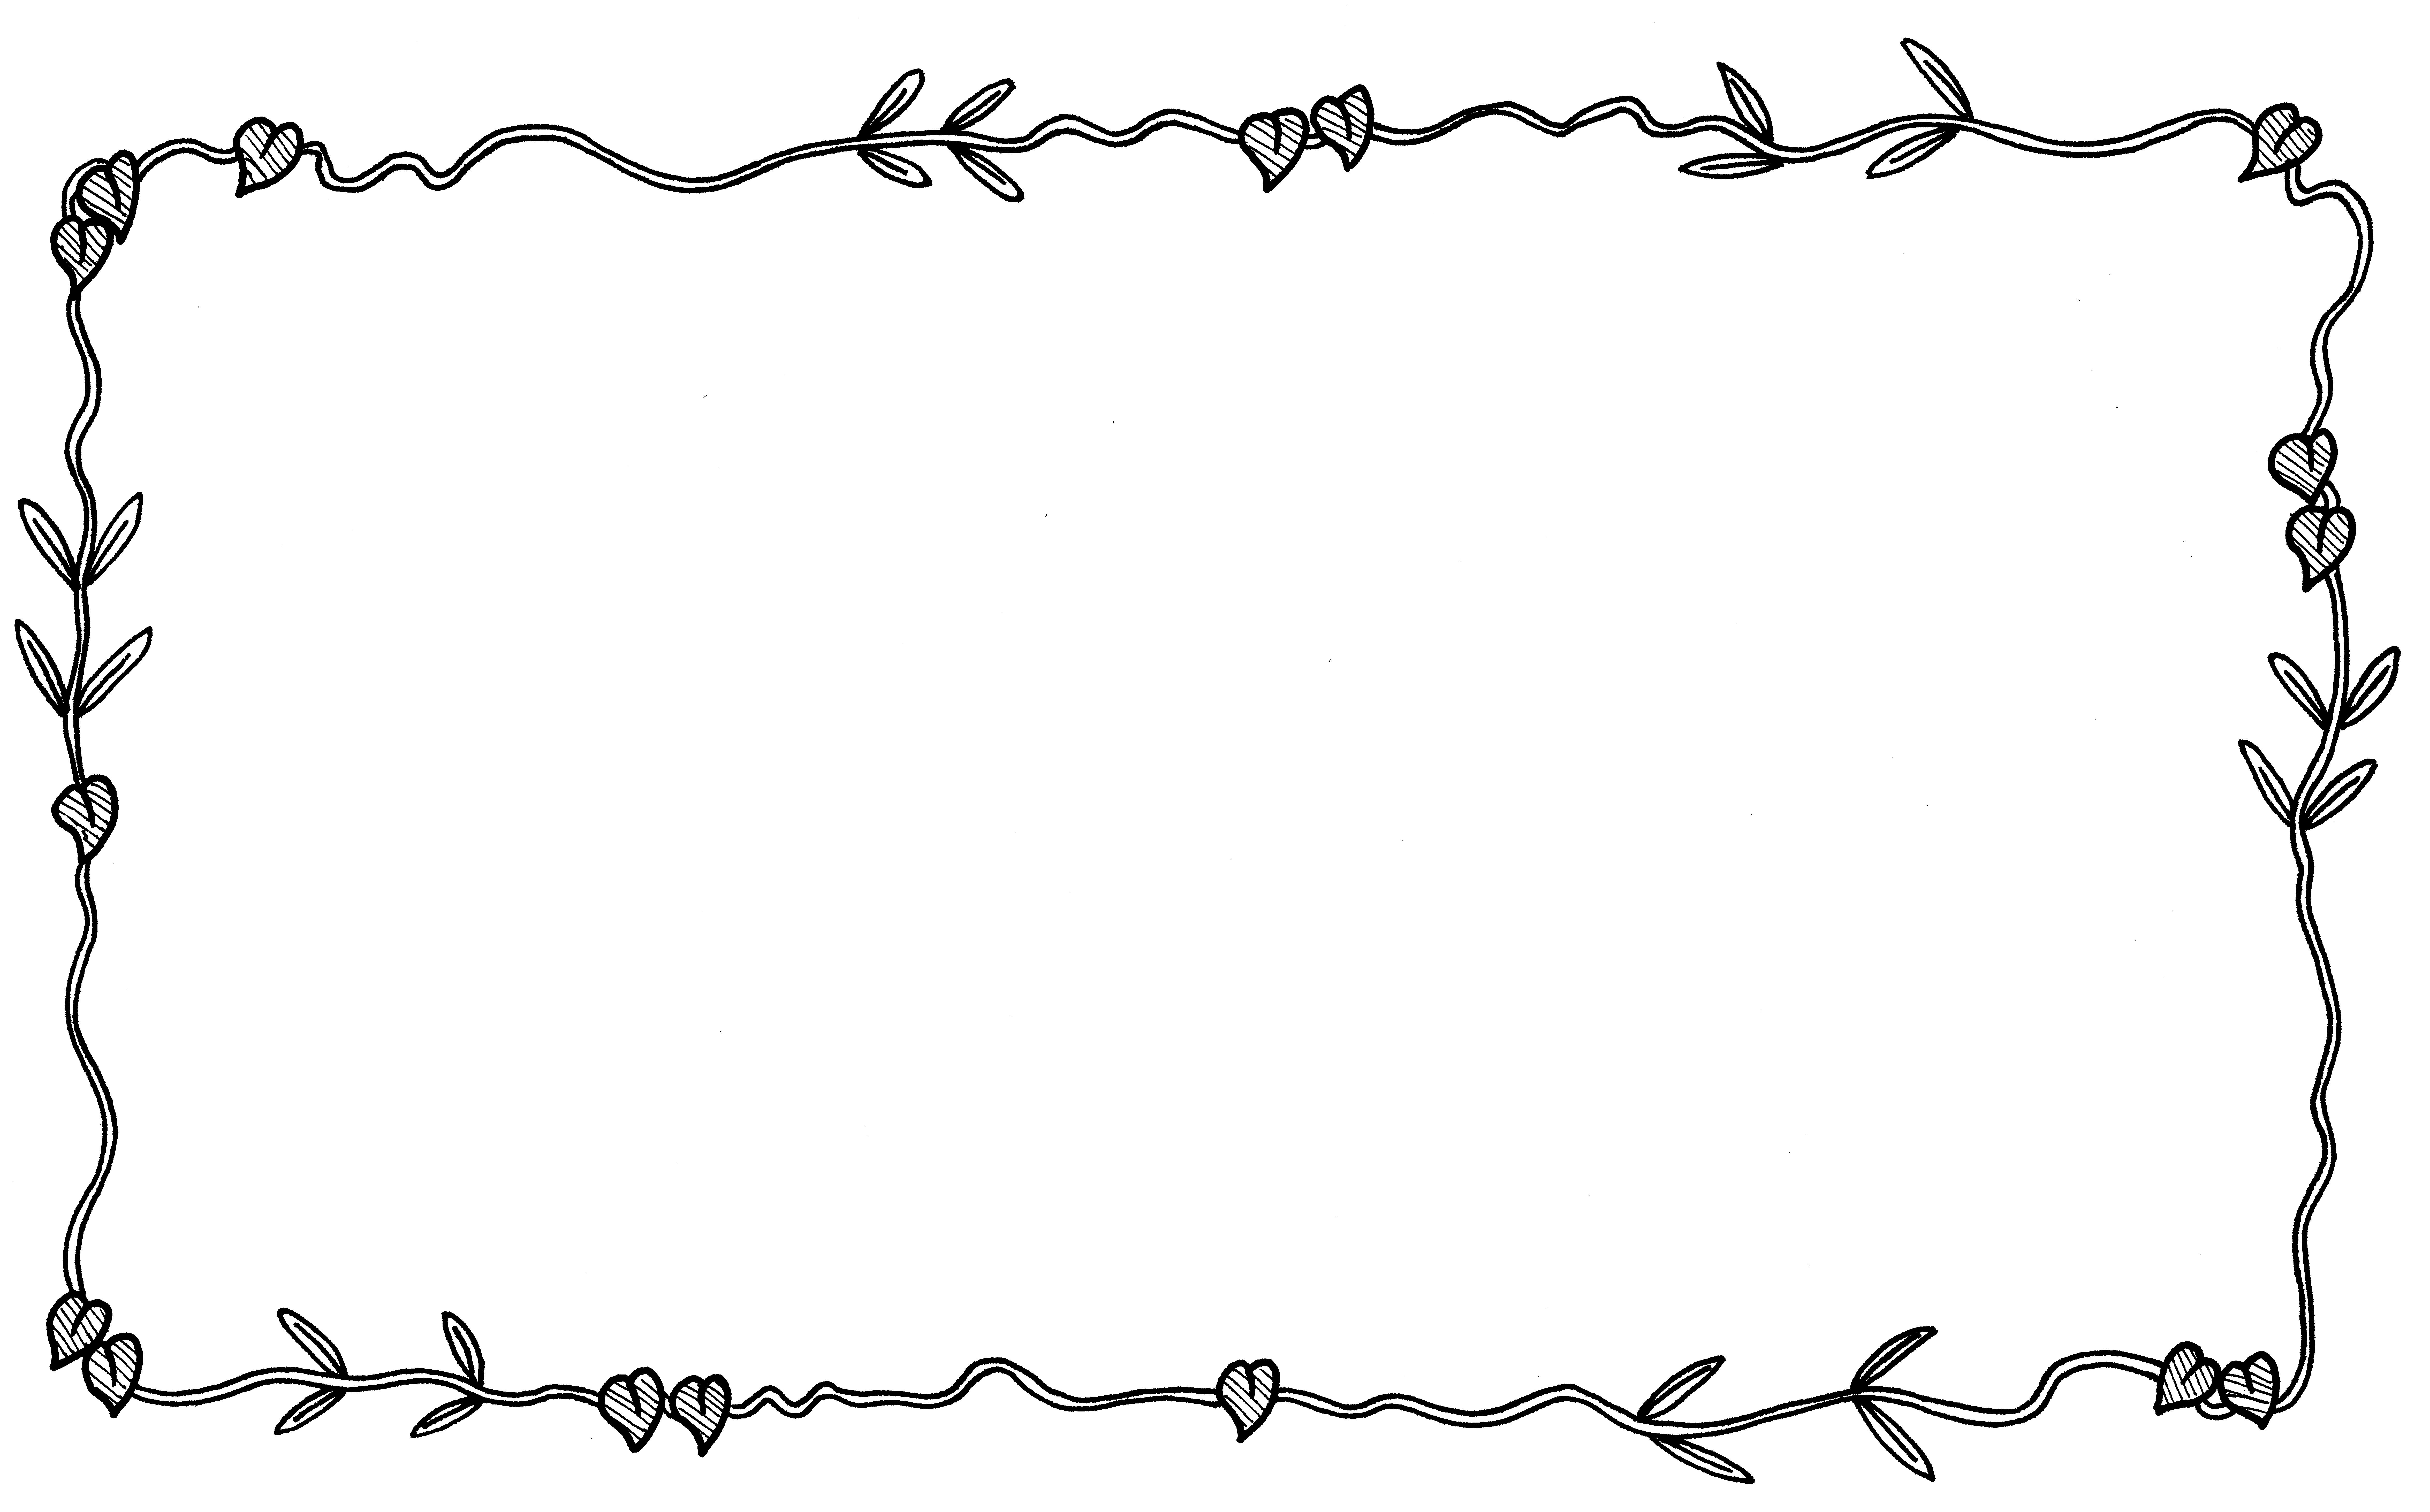 ppt 背景 背景图片 边框 模板 设计 相框 9400_5850